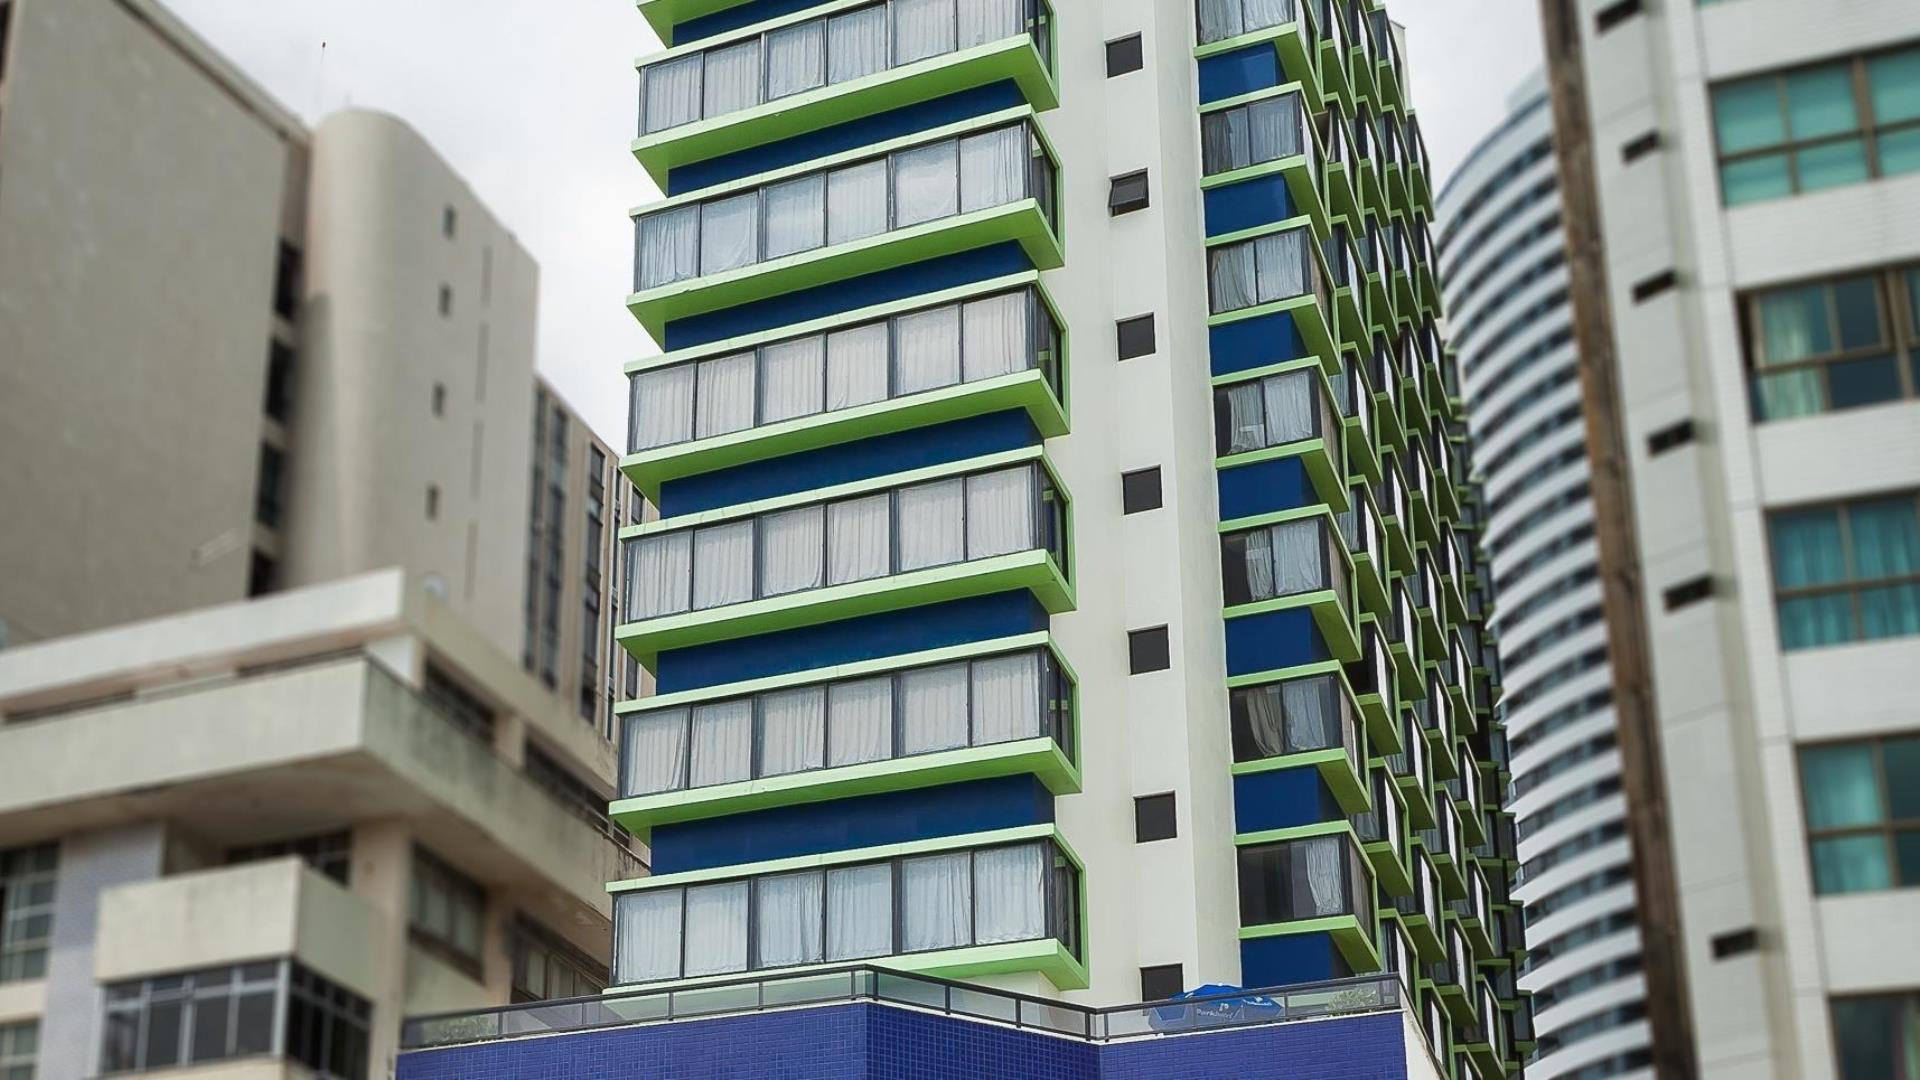 Brasilien Belem: Standard Hotel - Hotel Vila Rica